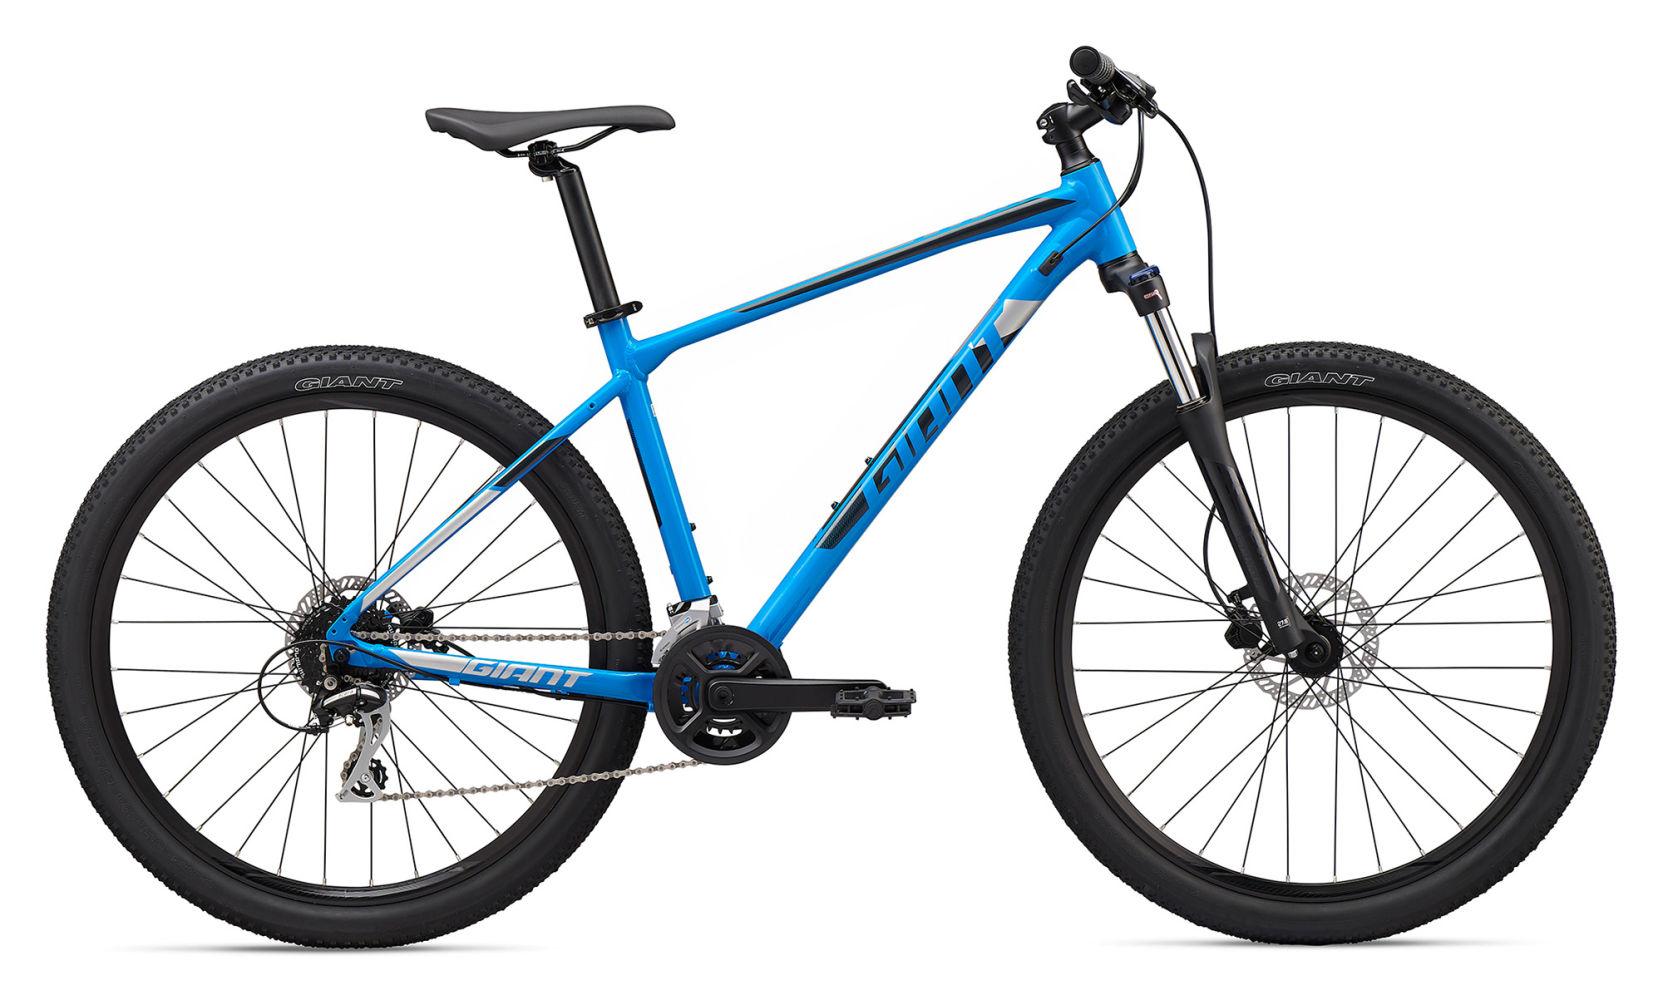 giant atx blue mountain bike